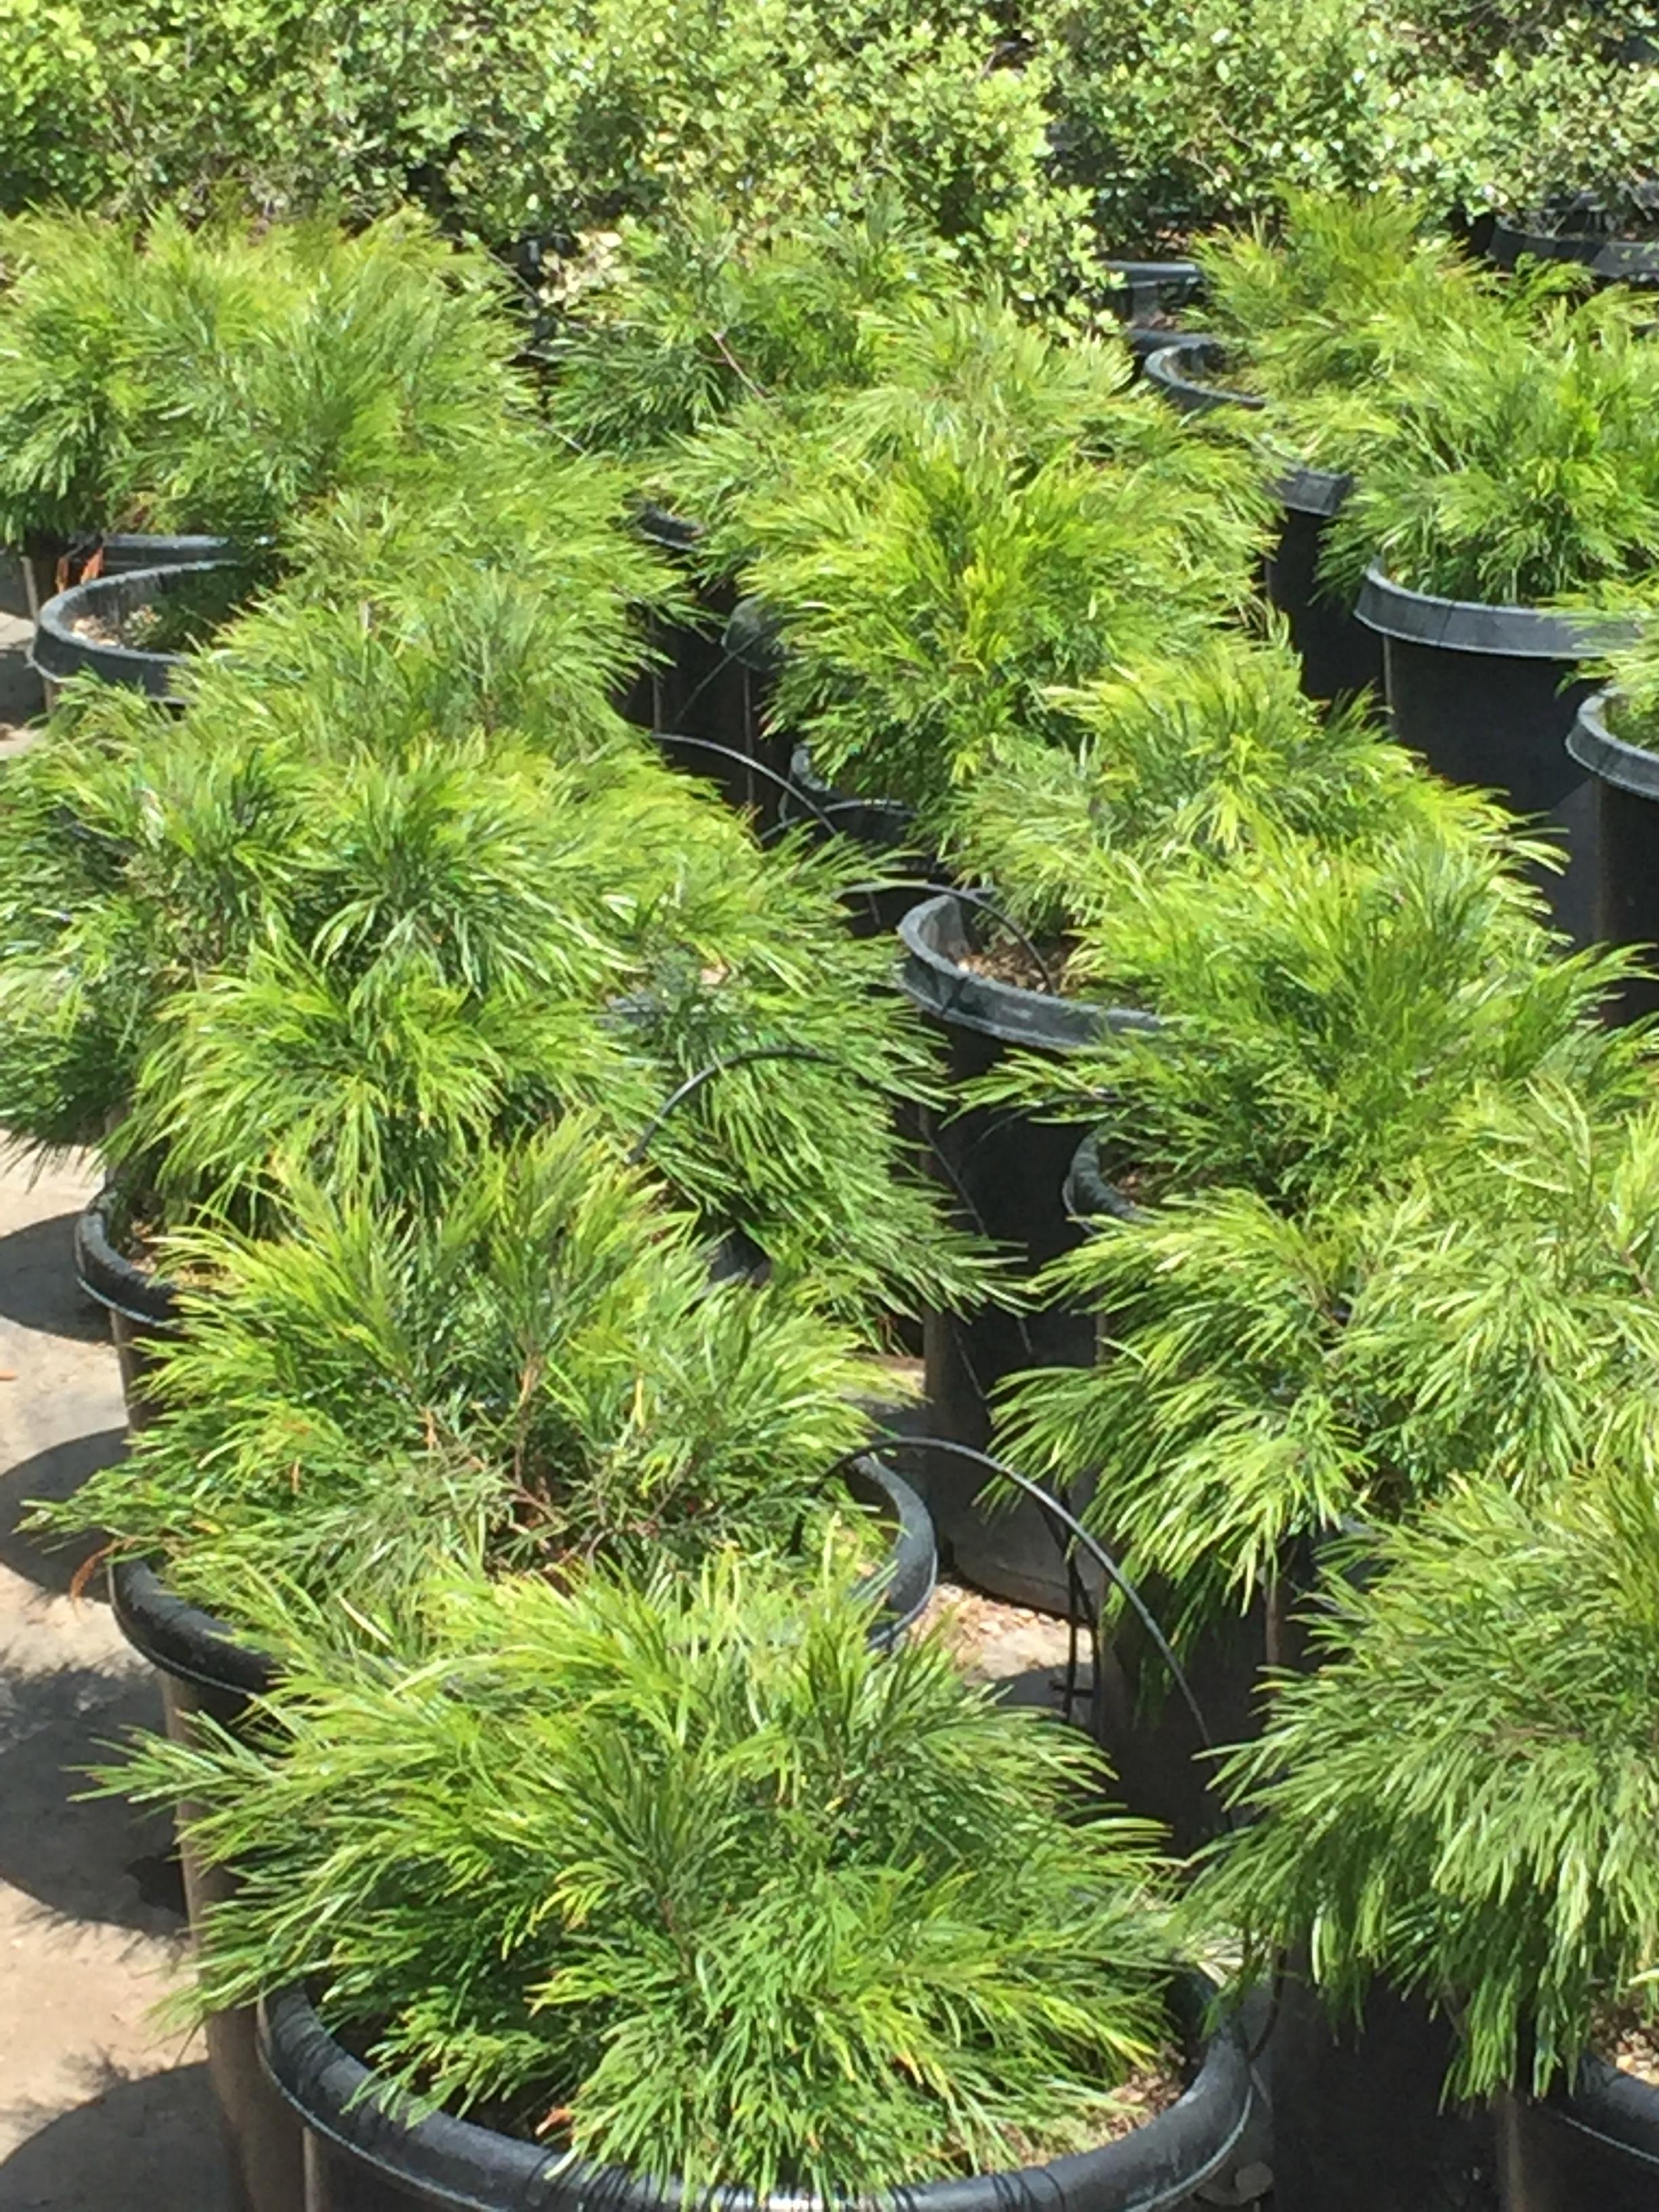 15 gal - Acacia cognata 'Cousin Itt'